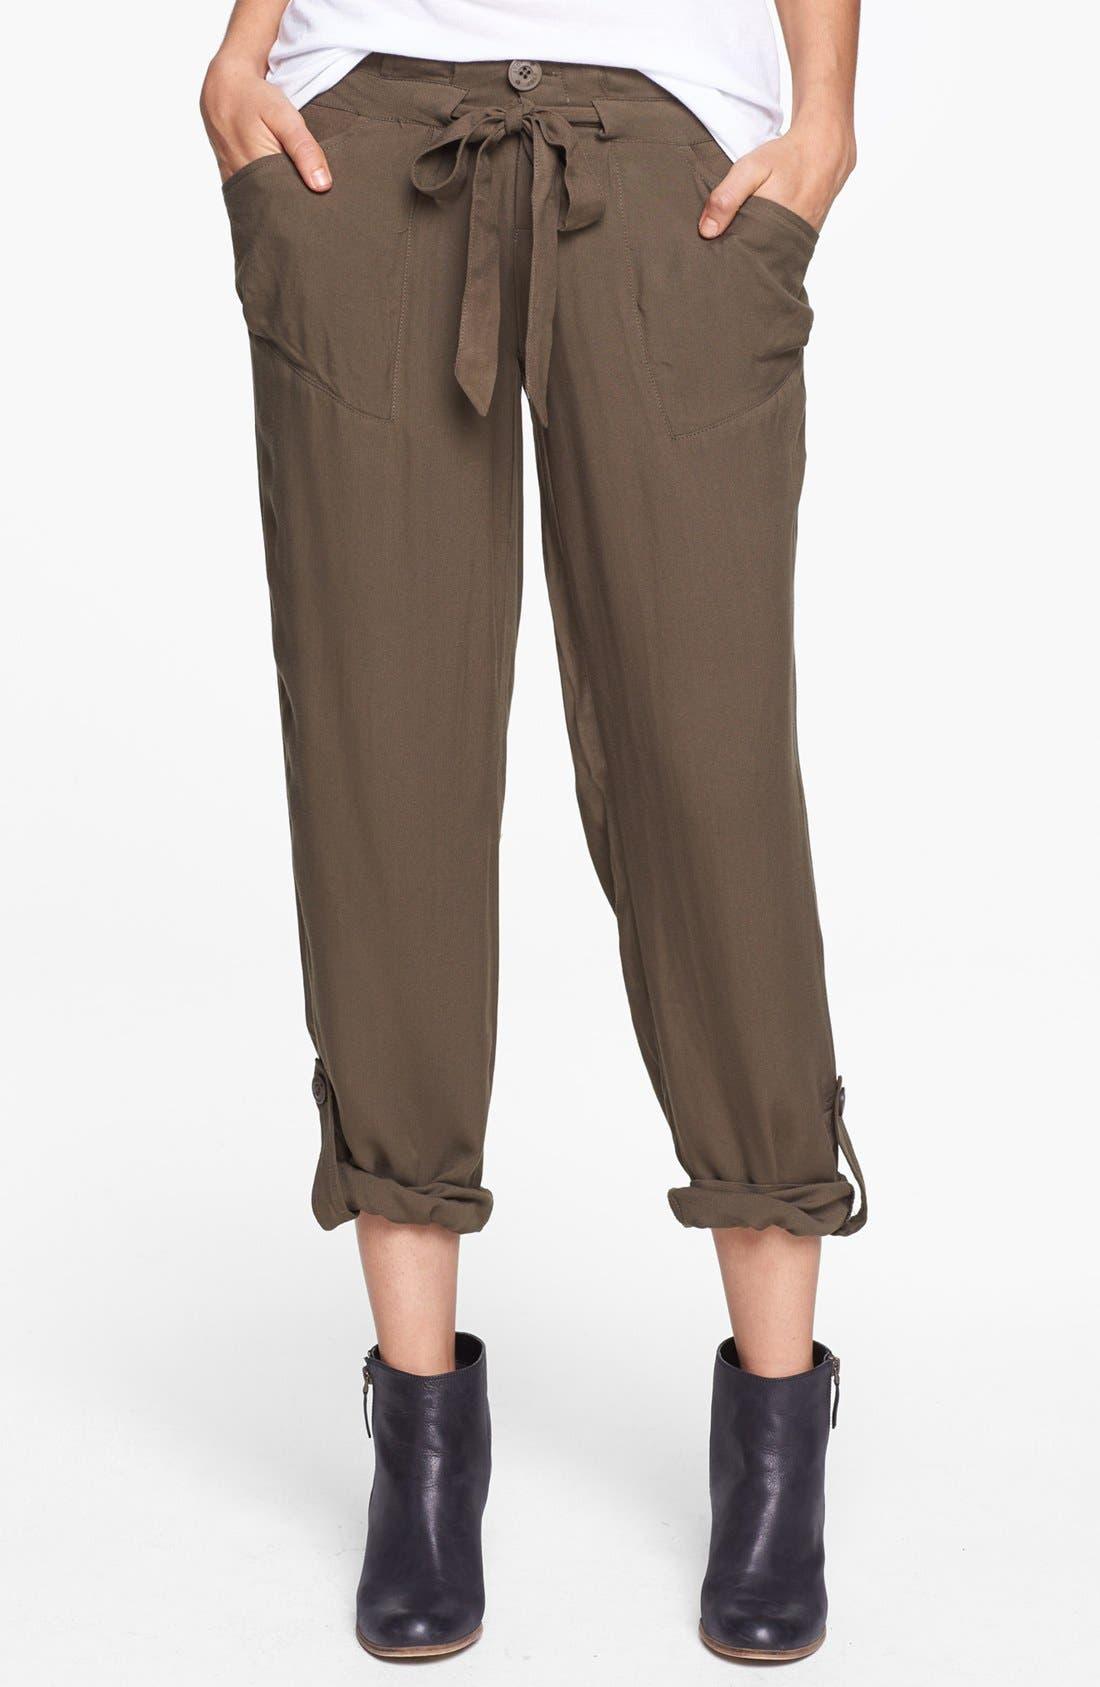 Alternate Image 1 Selected - Jolt Drawstring Woven Pants (Juniors)